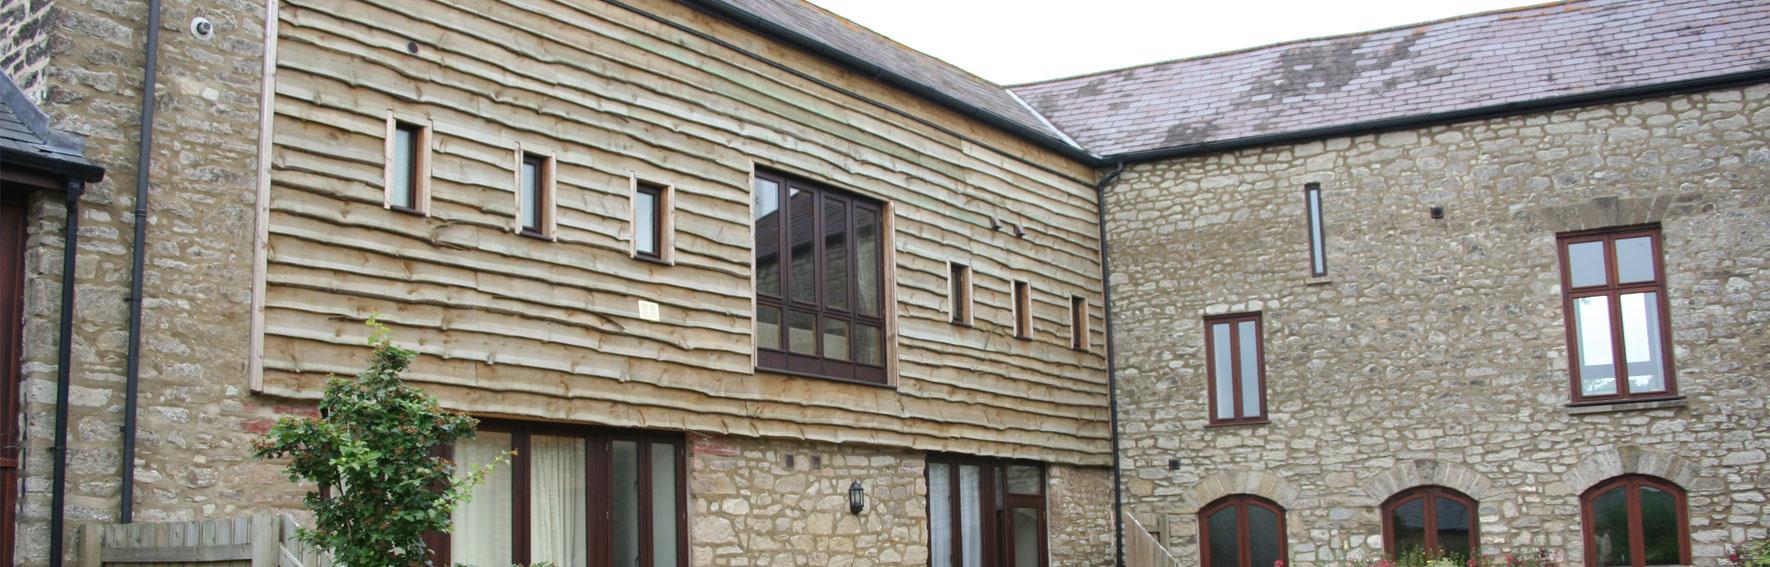 Venture Property - Barn Conversions - Property Conversions - Devon